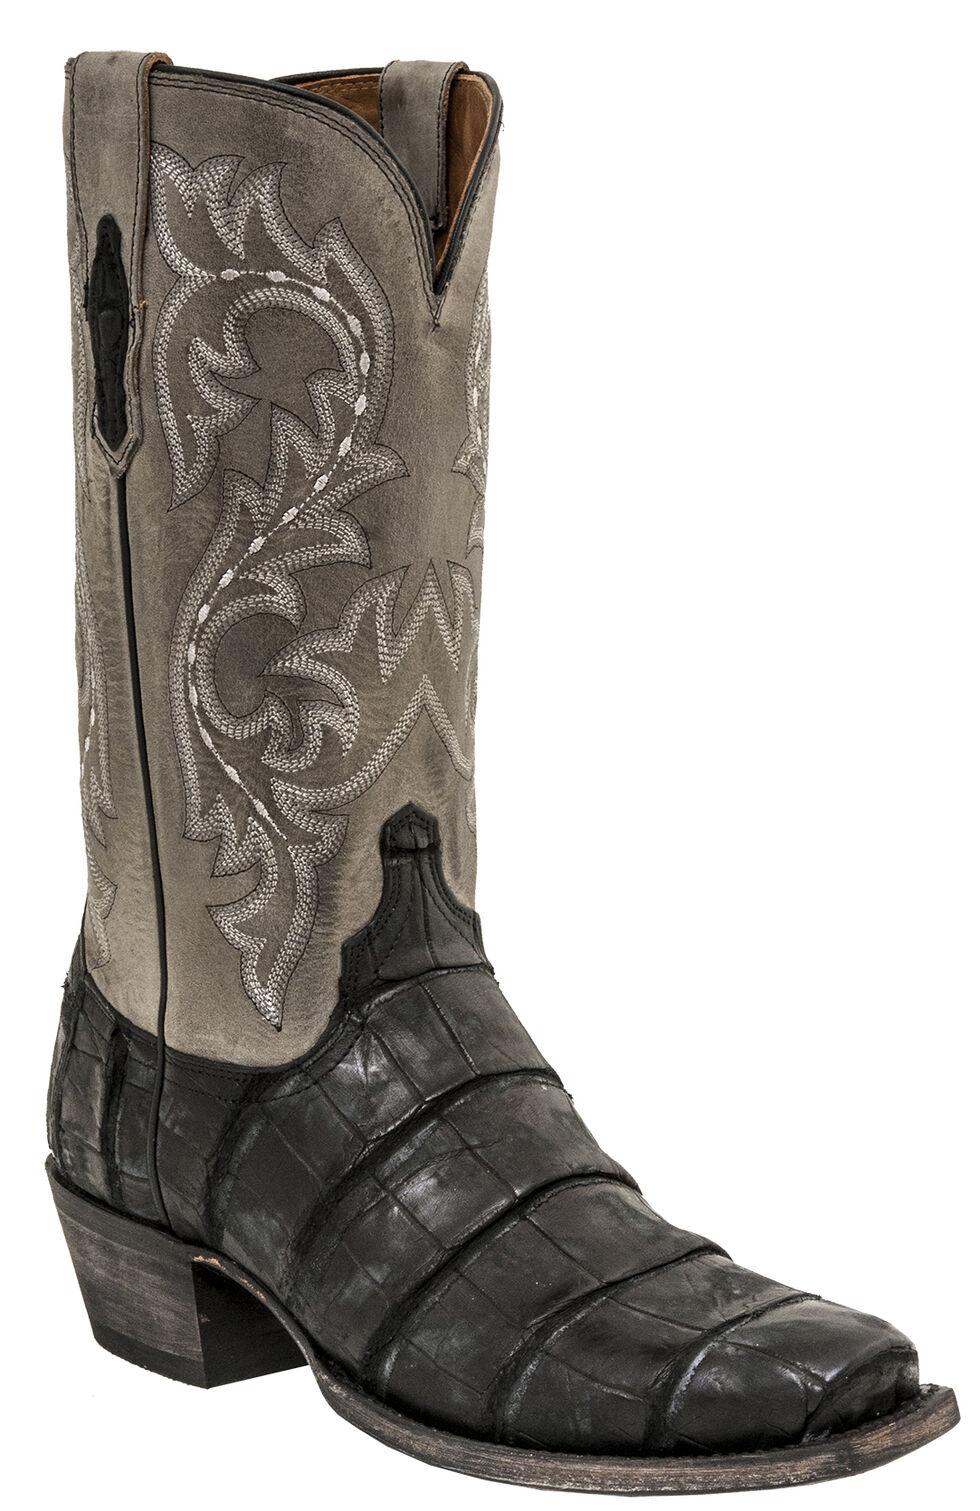 Lucchese Men's Handmade Burke Alligator Western Boots - Square Toe, Black, hi-res